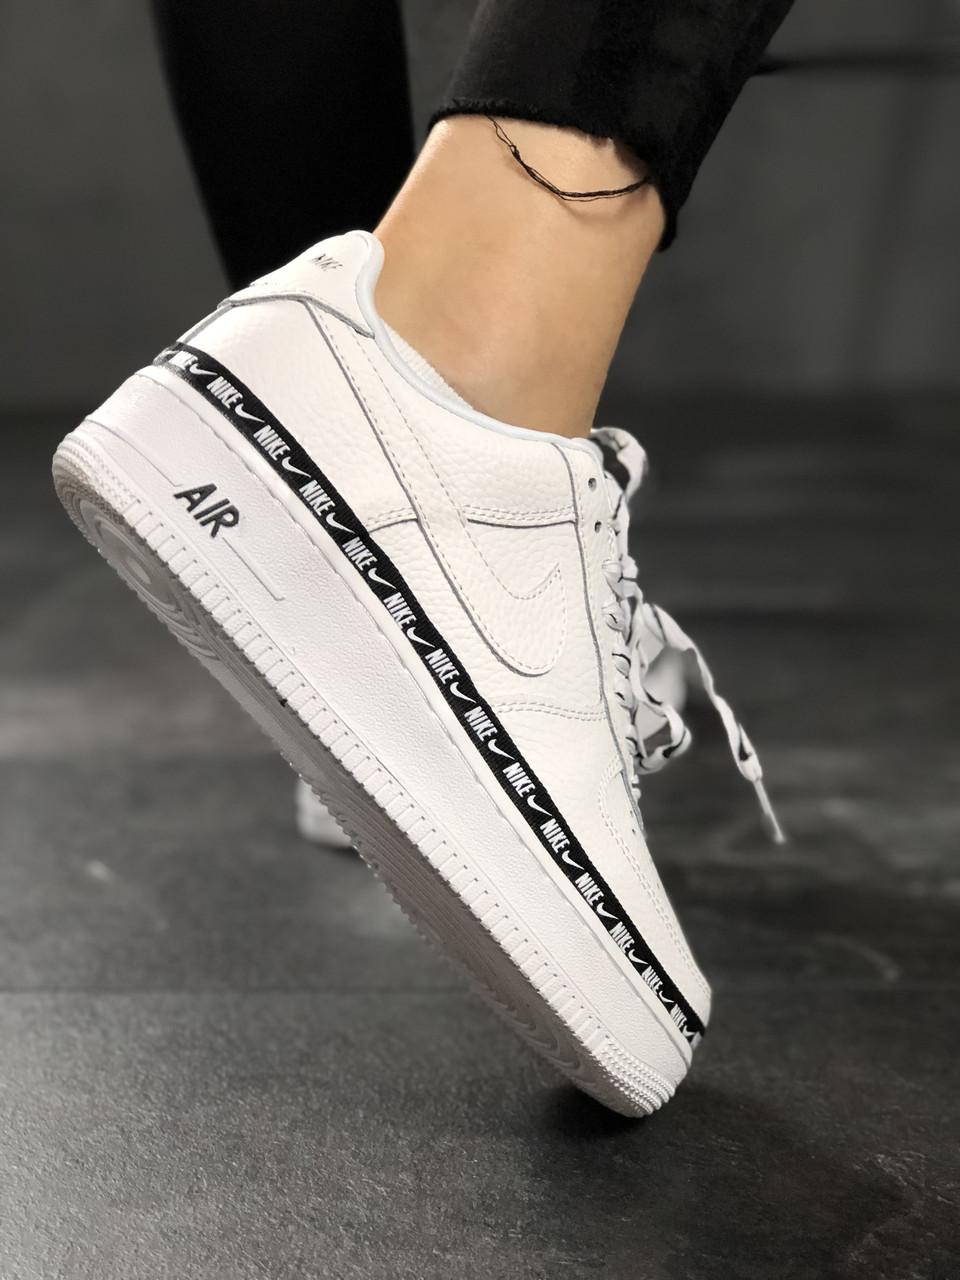 Кроссовки Nike Air Force 1 '07 Low SE Premium White Black 5